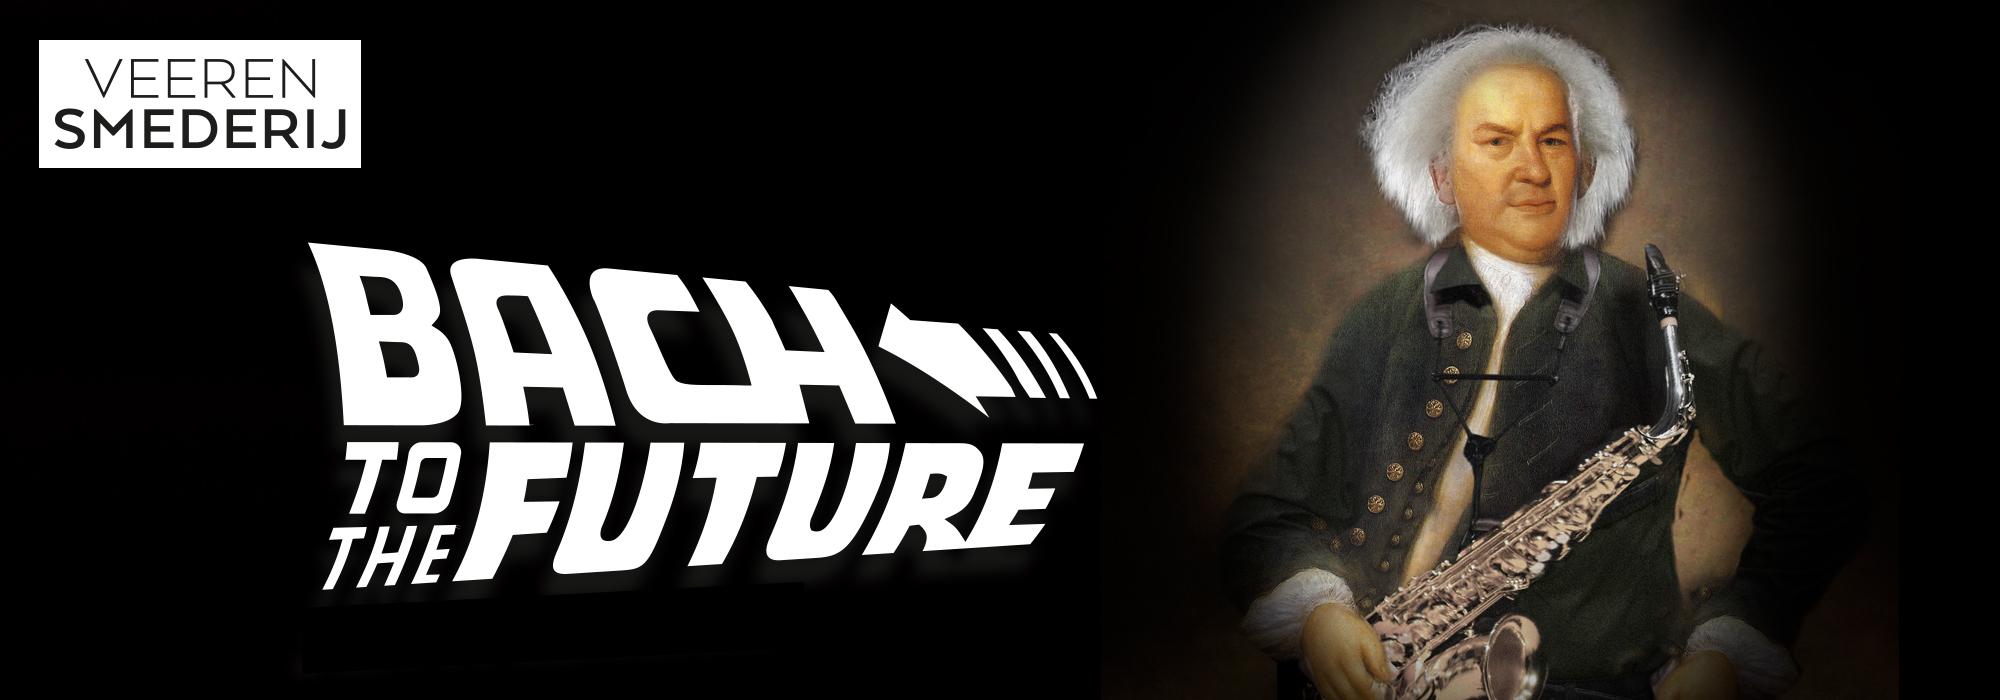 Bach to the Future 2 @ De Veerensmederij